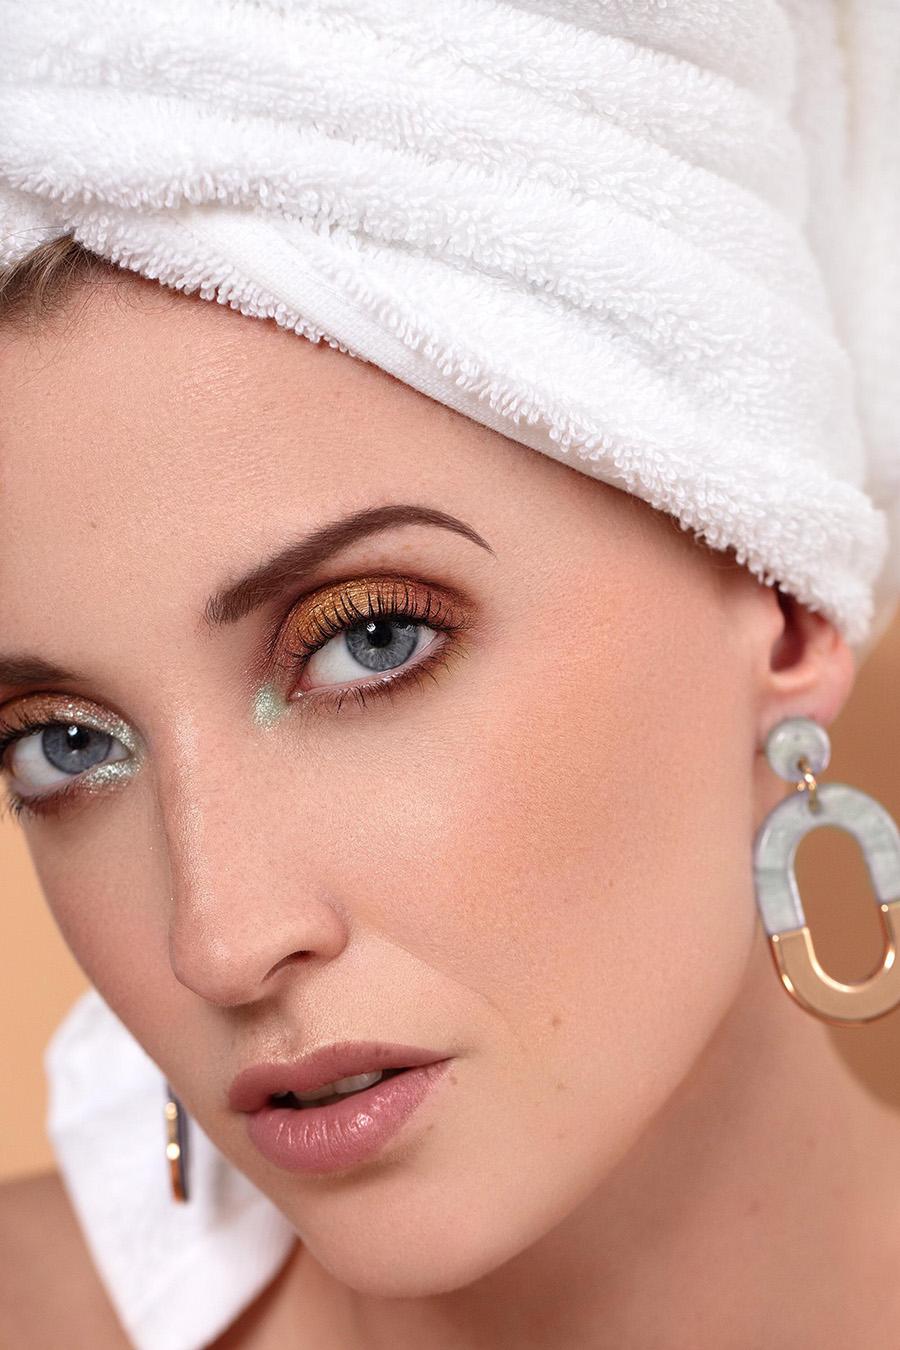 make up en visagie voor laure heij en karin van berkel